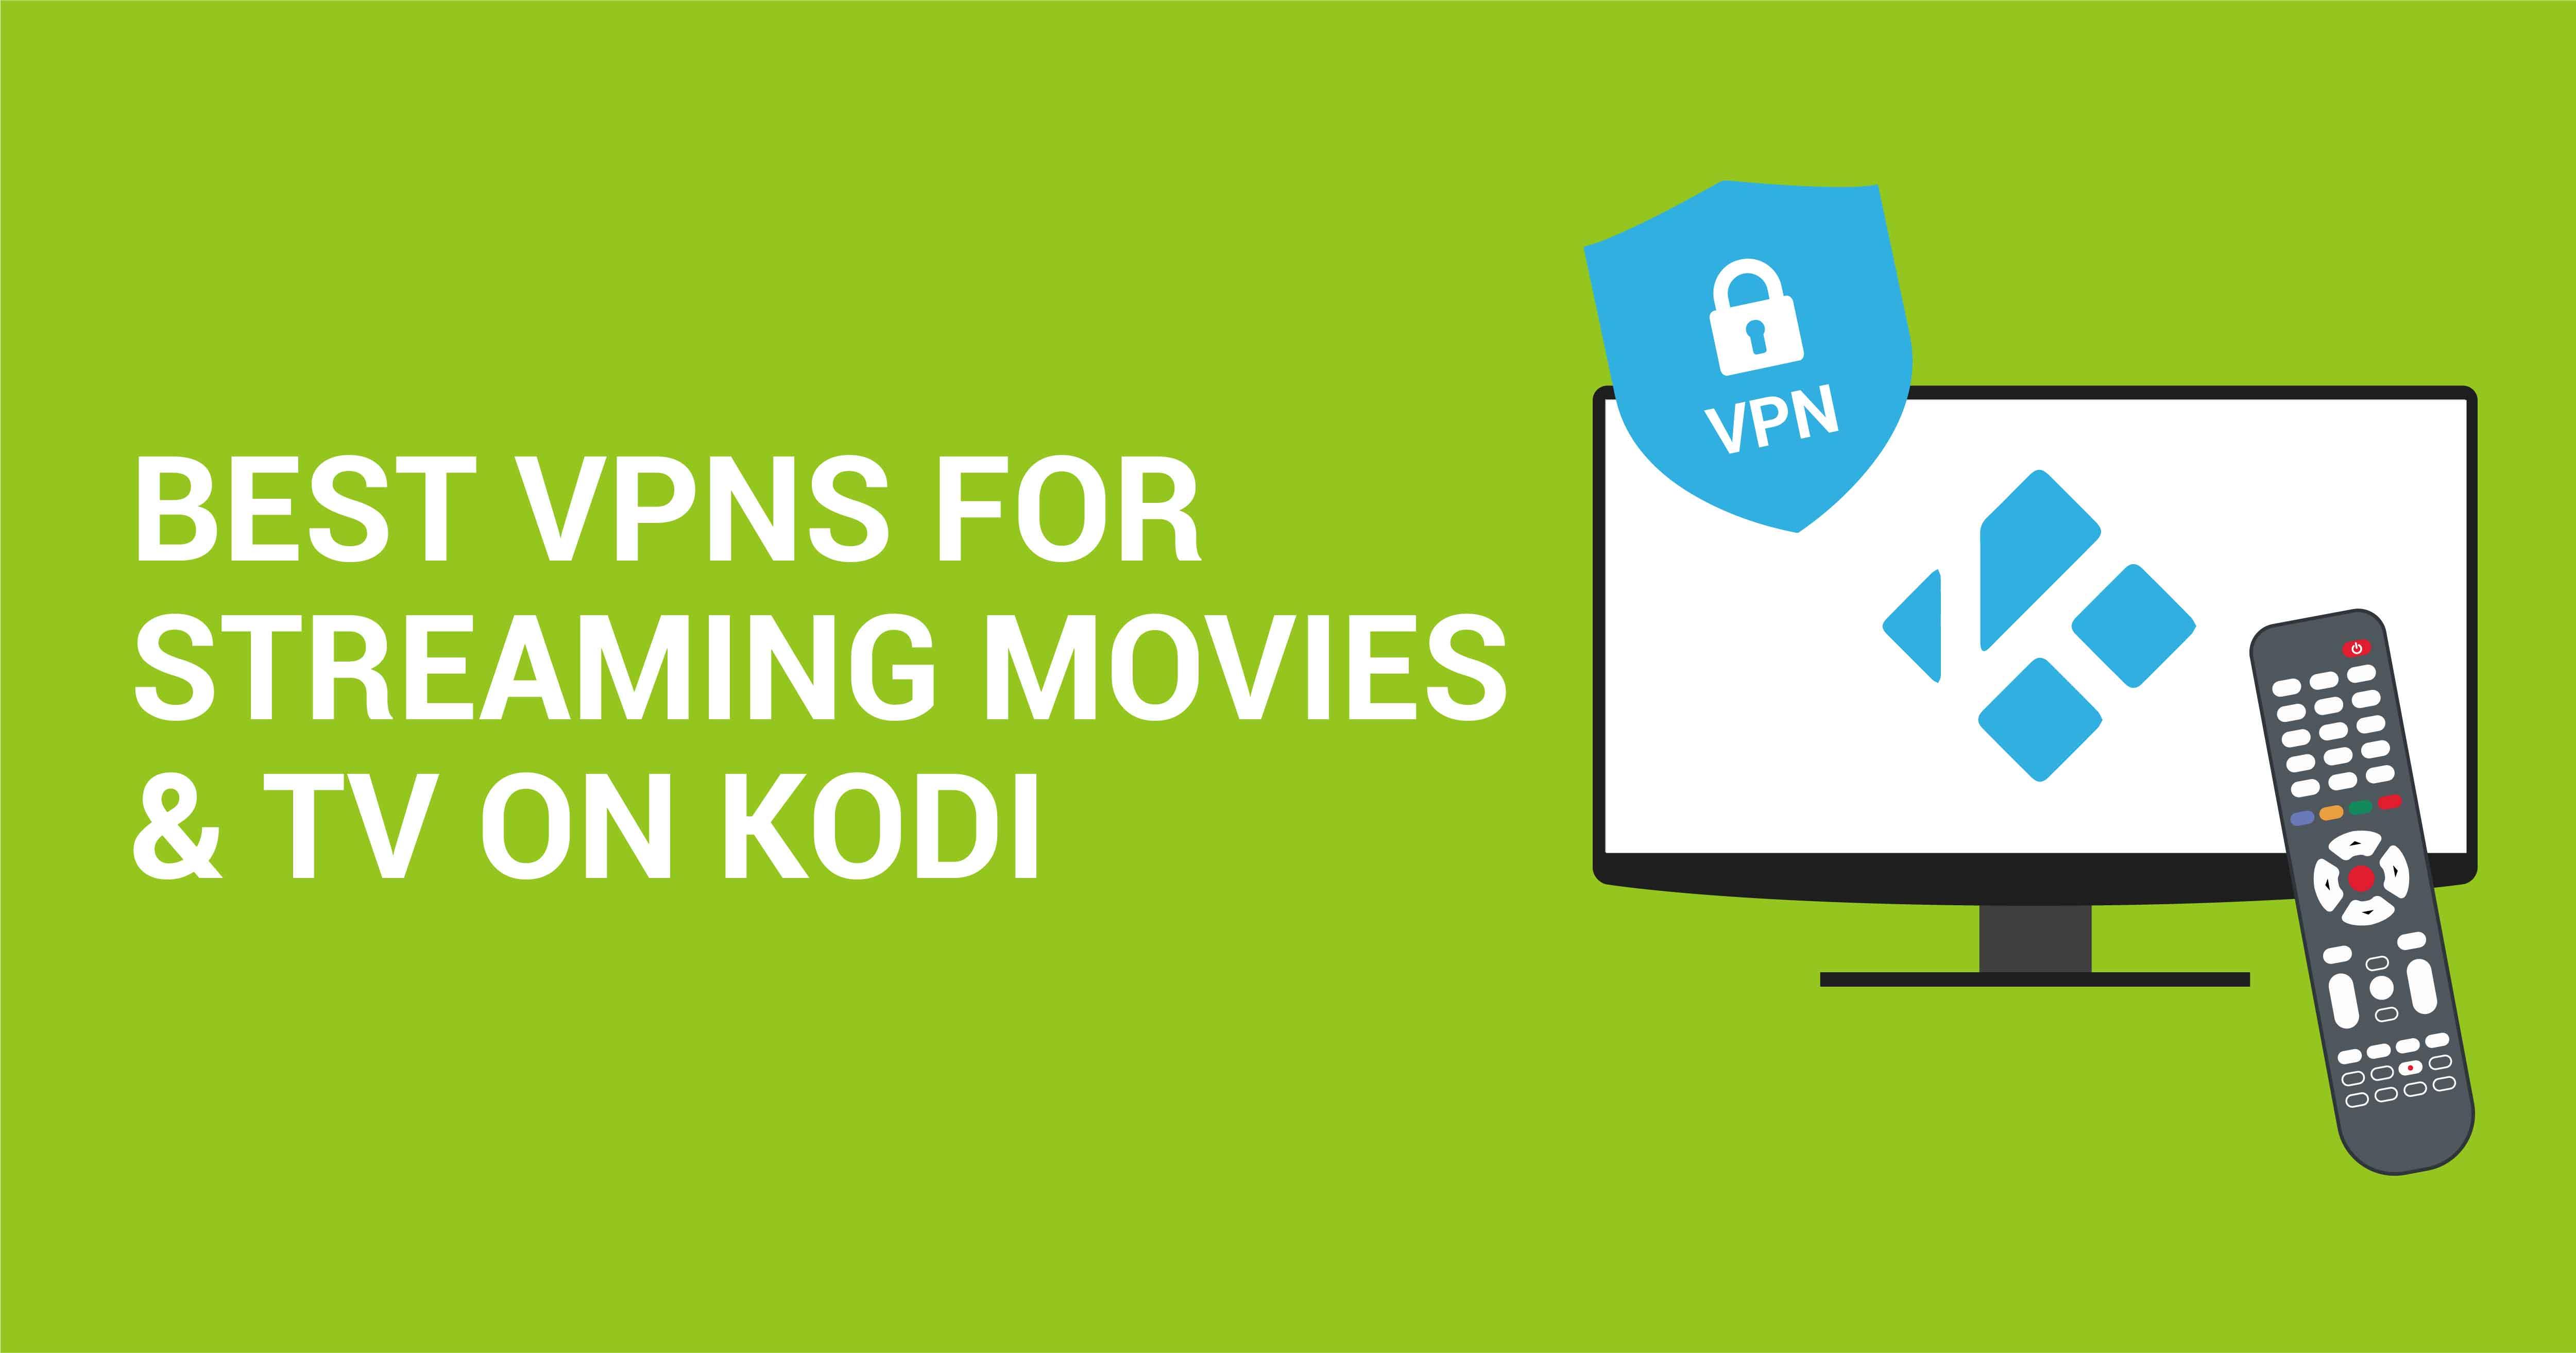 5 Beste Kodi Vpns In 2021 So Streamst Du Sicher Und Sorglos